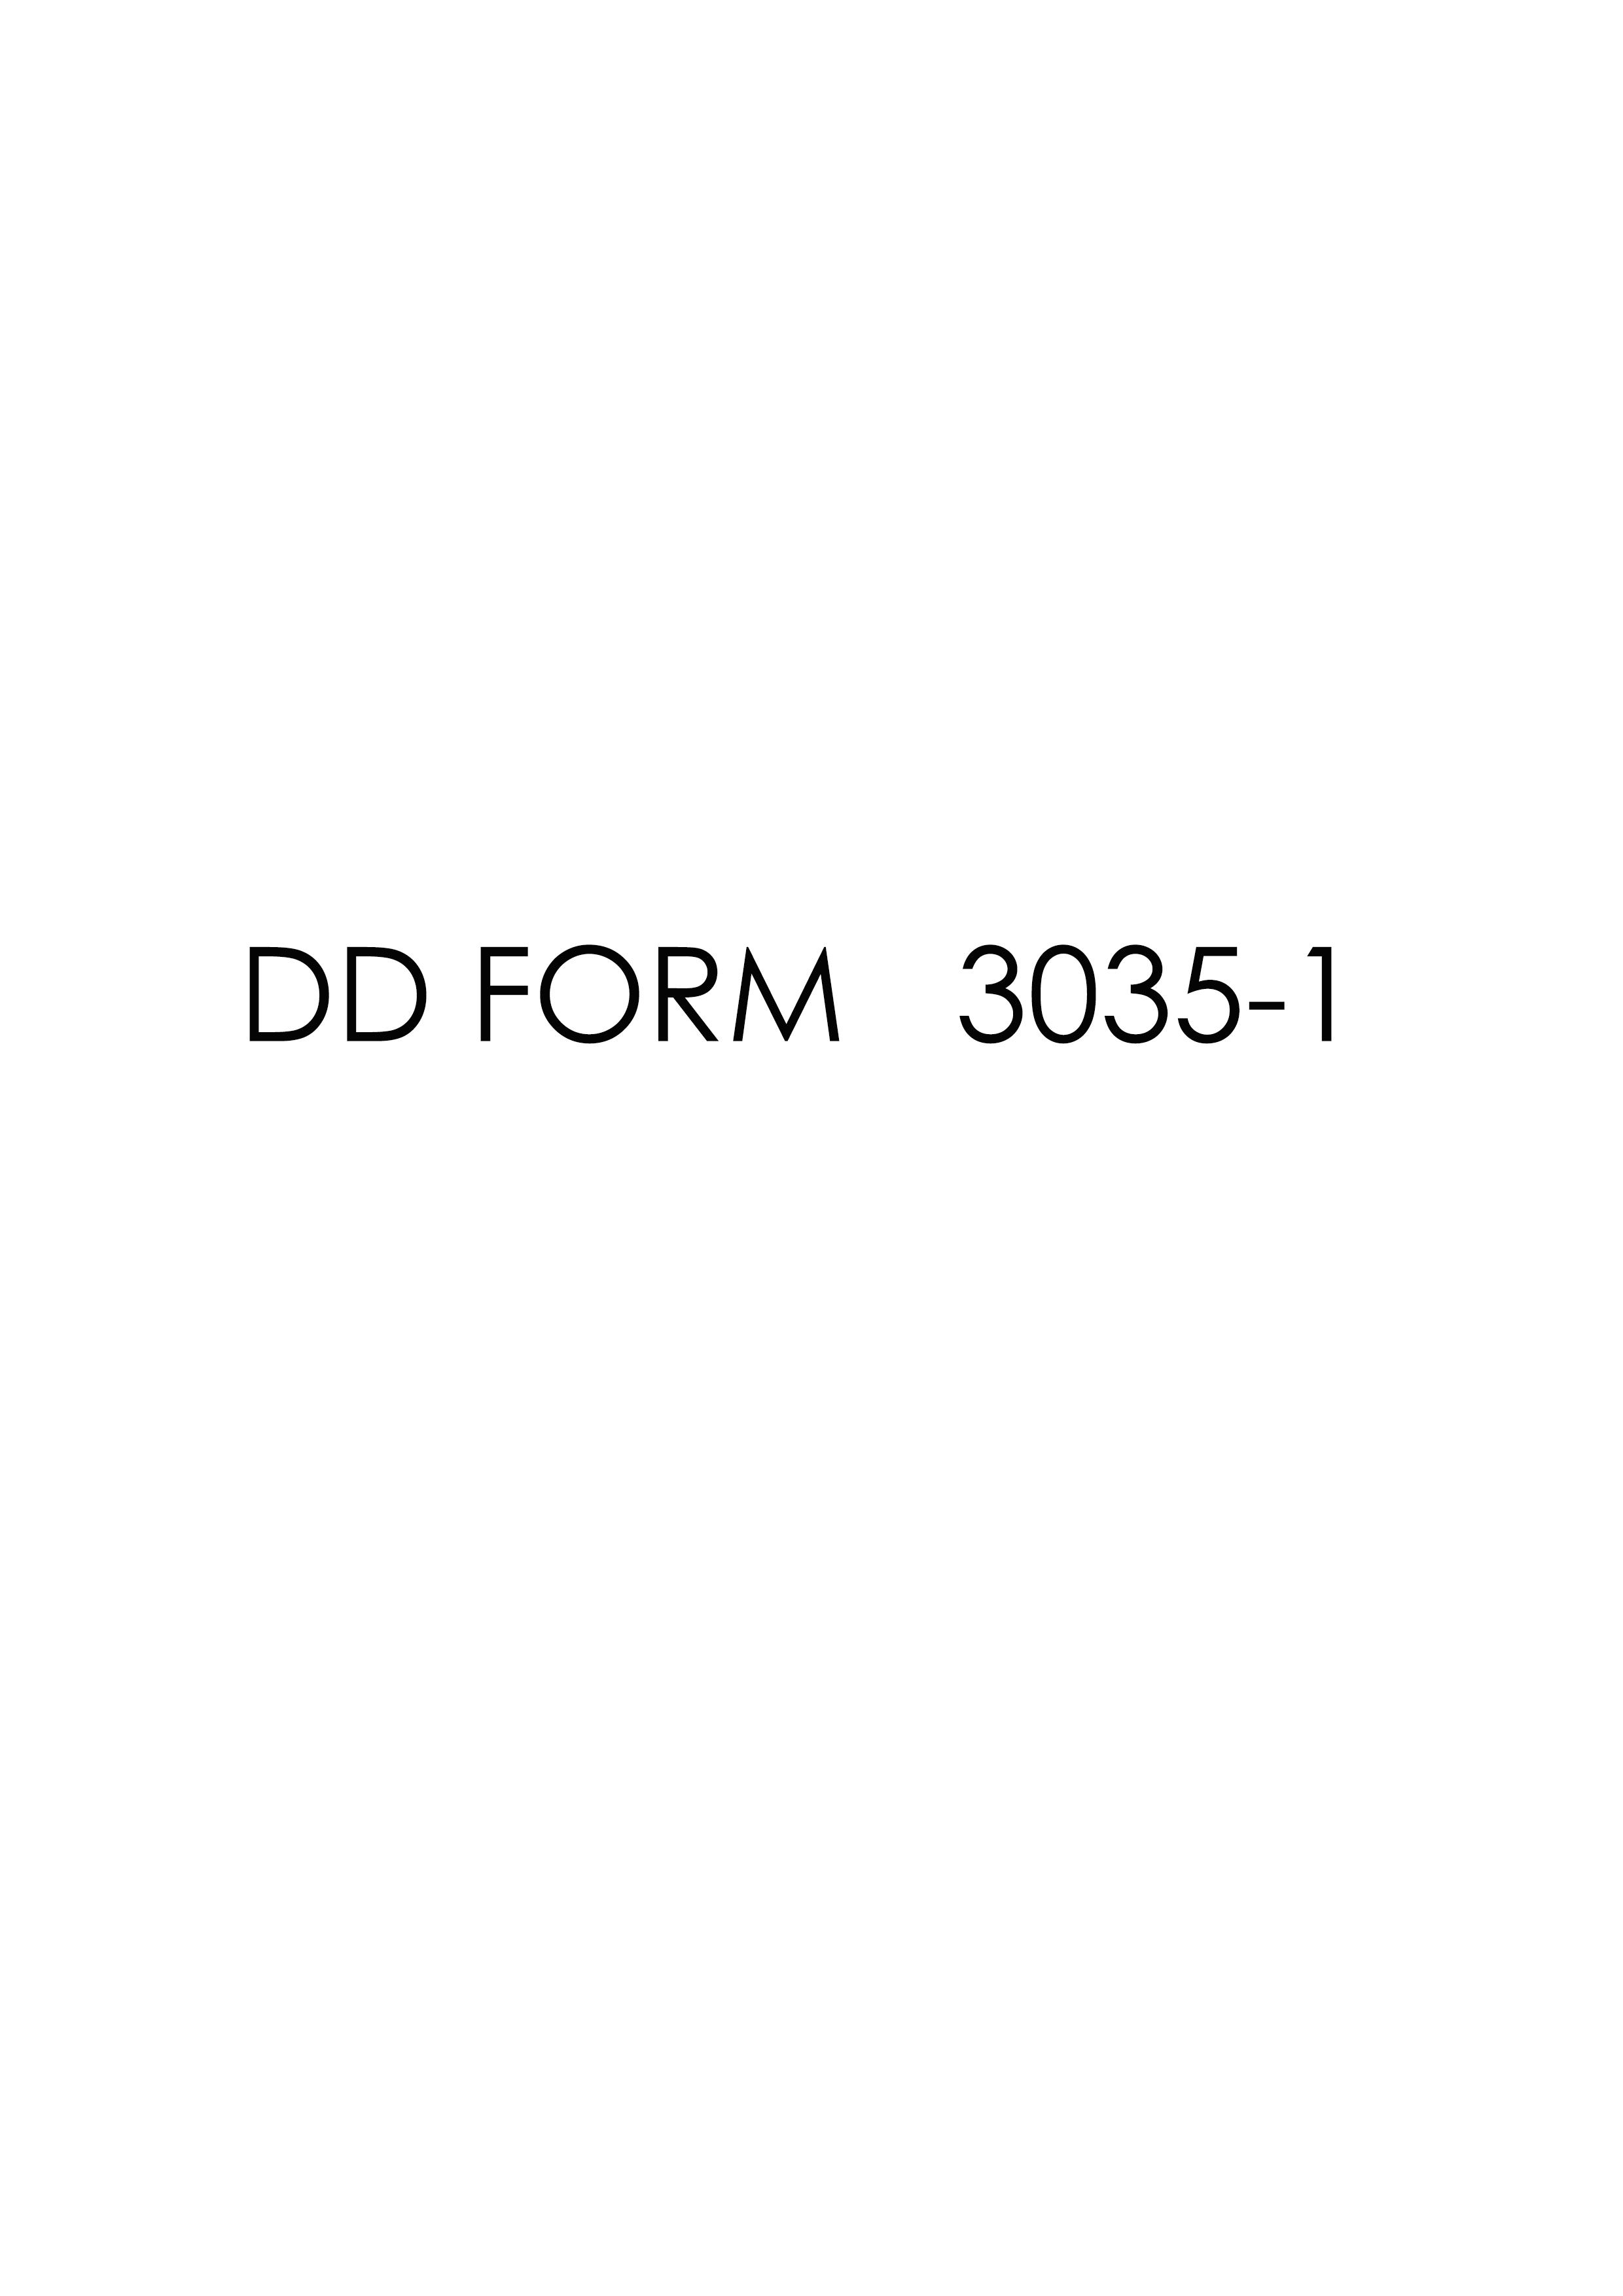 Download dd Form 3035-1 Free